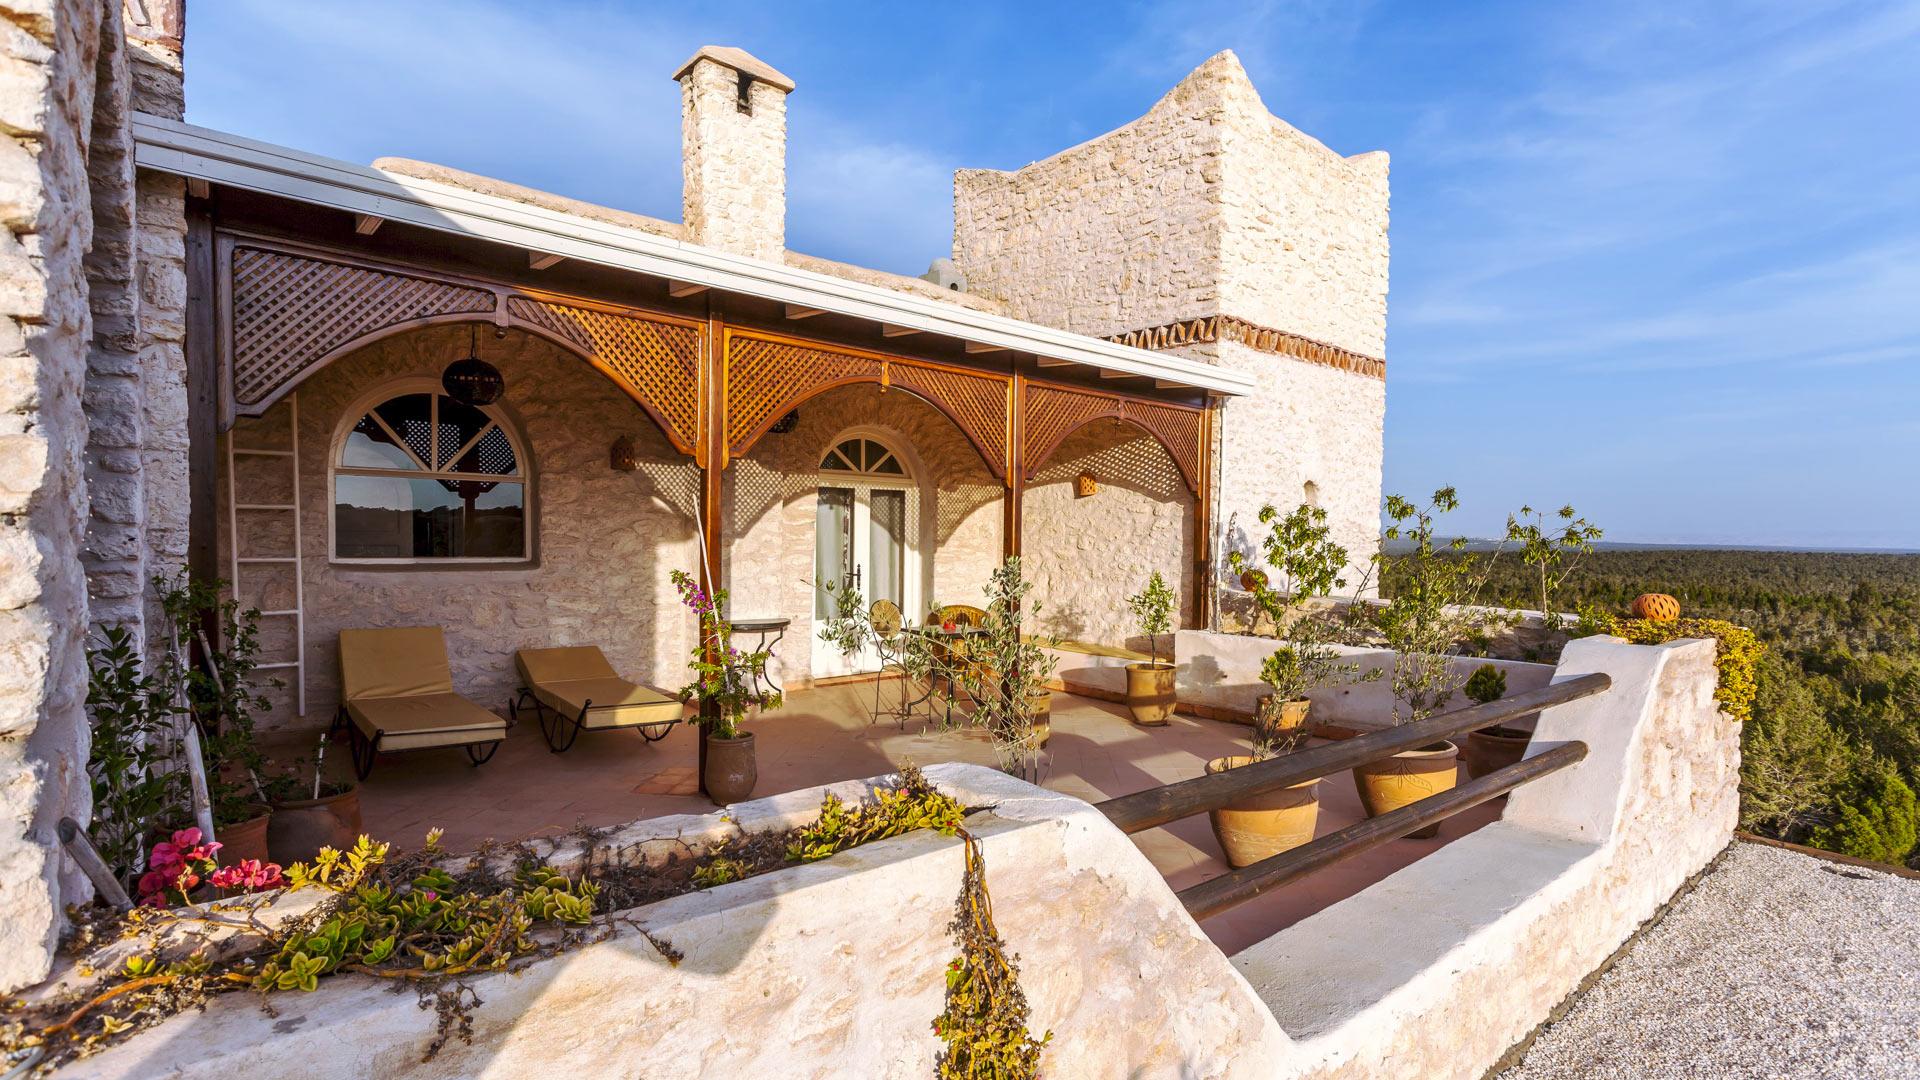 Villa des romarins villa rental in essaouira outside - Les jardins de villa maroc essaouira ...